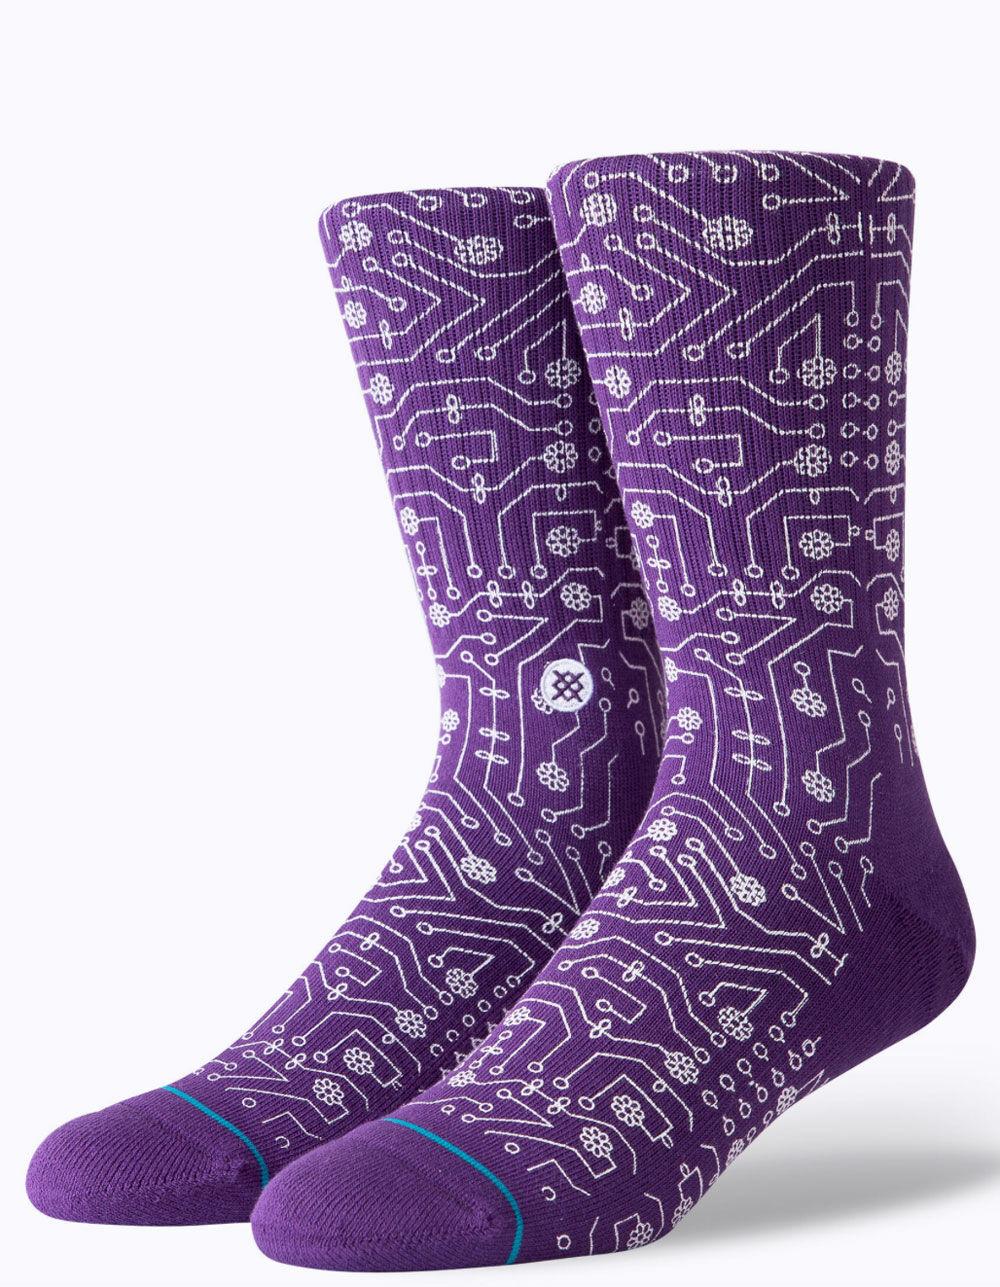 STANCE Connector Purple Crew Socks